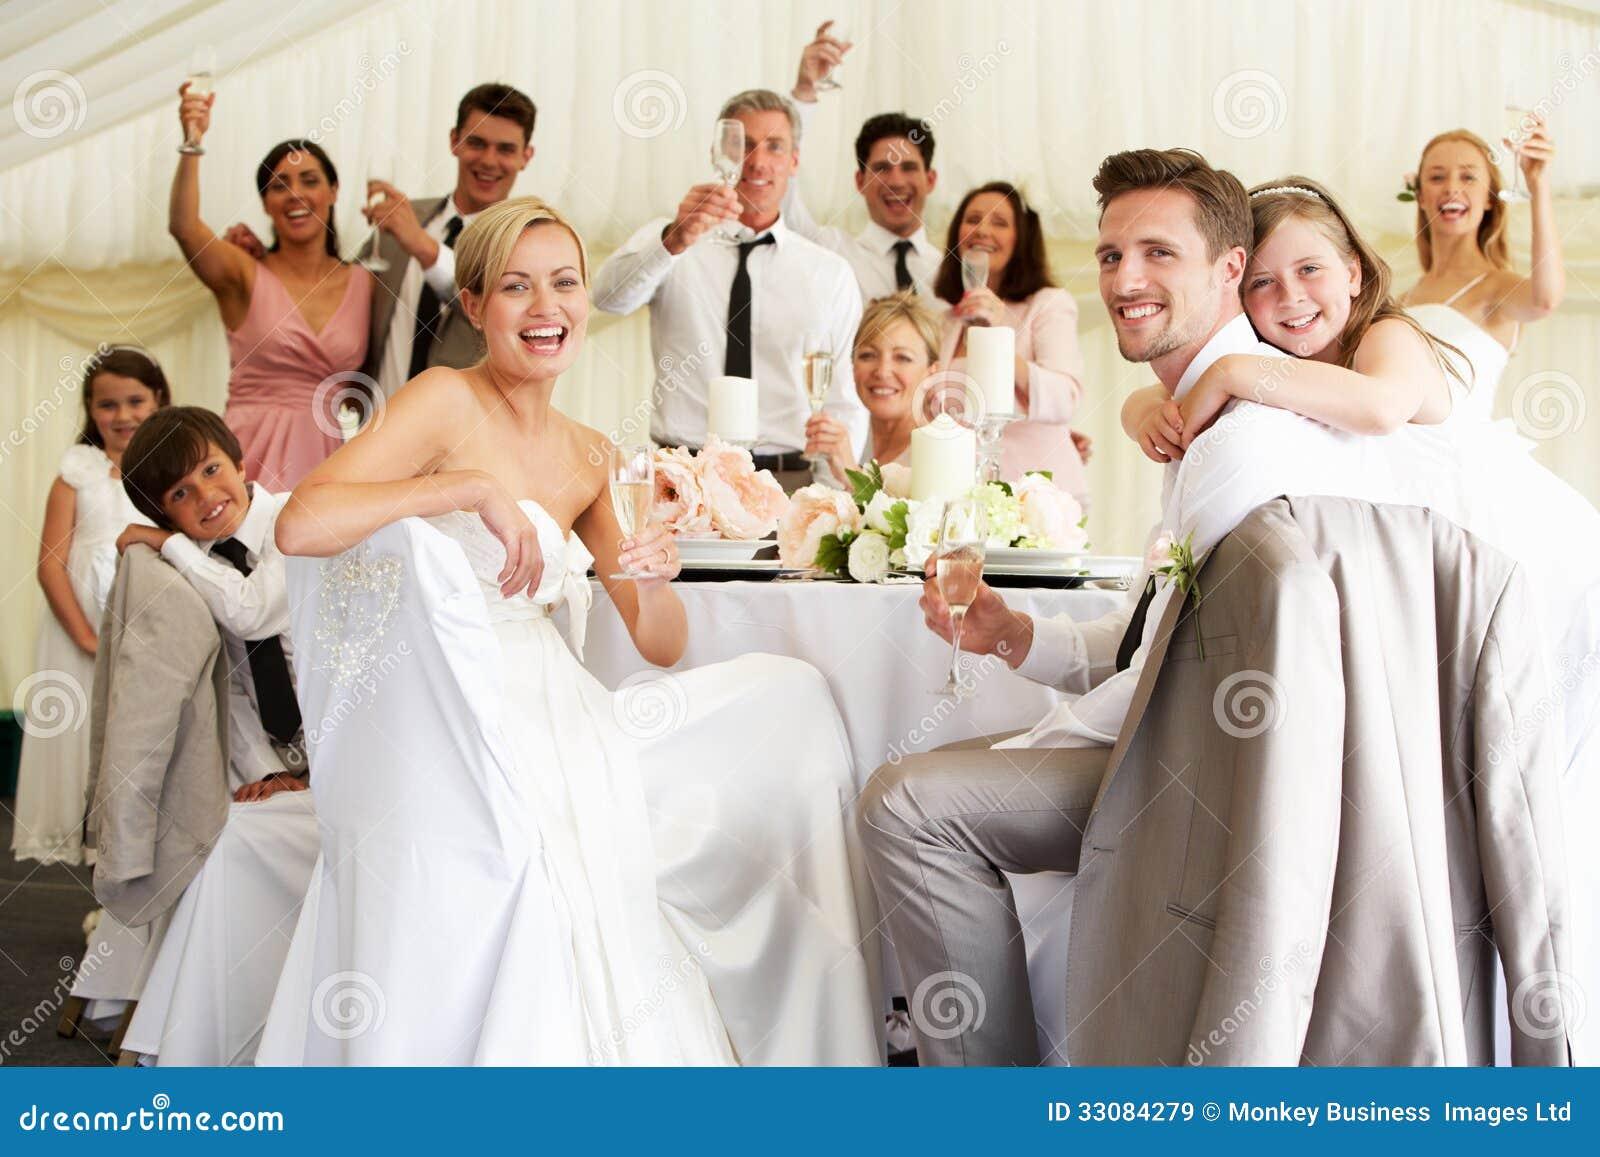 Bruid en Bruidegom Celebrating With Guests bij Ontvangst